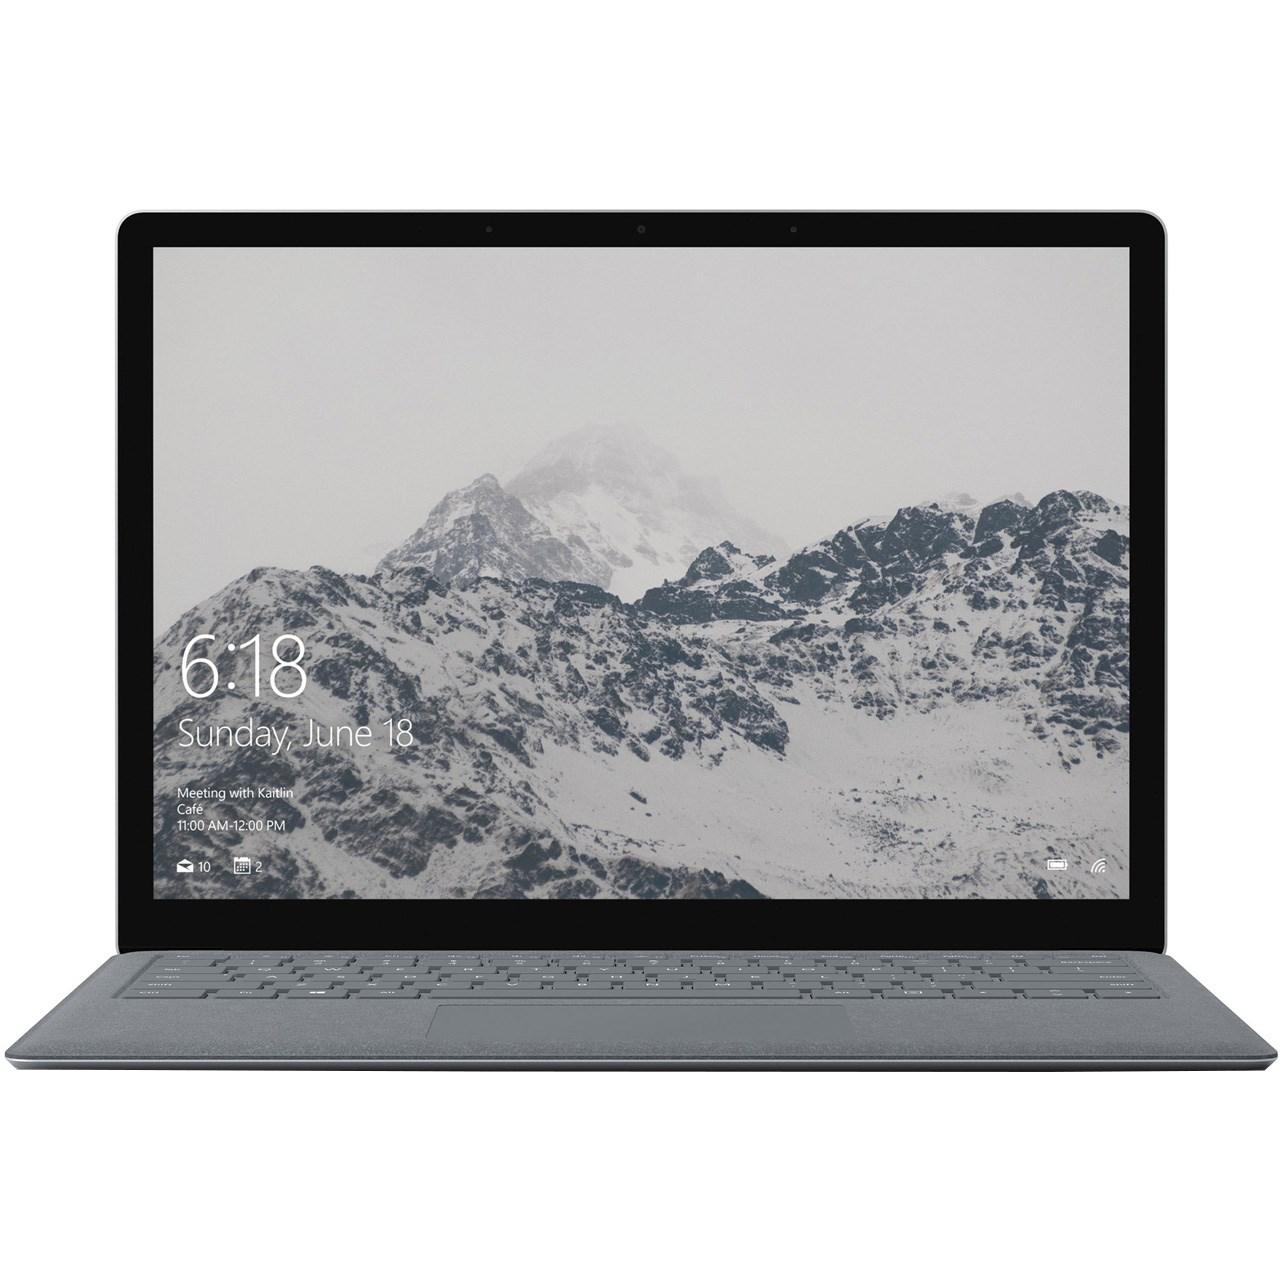 لپ تاپ 13 اینچی مایکروسافت مدل Surface Laptop - B